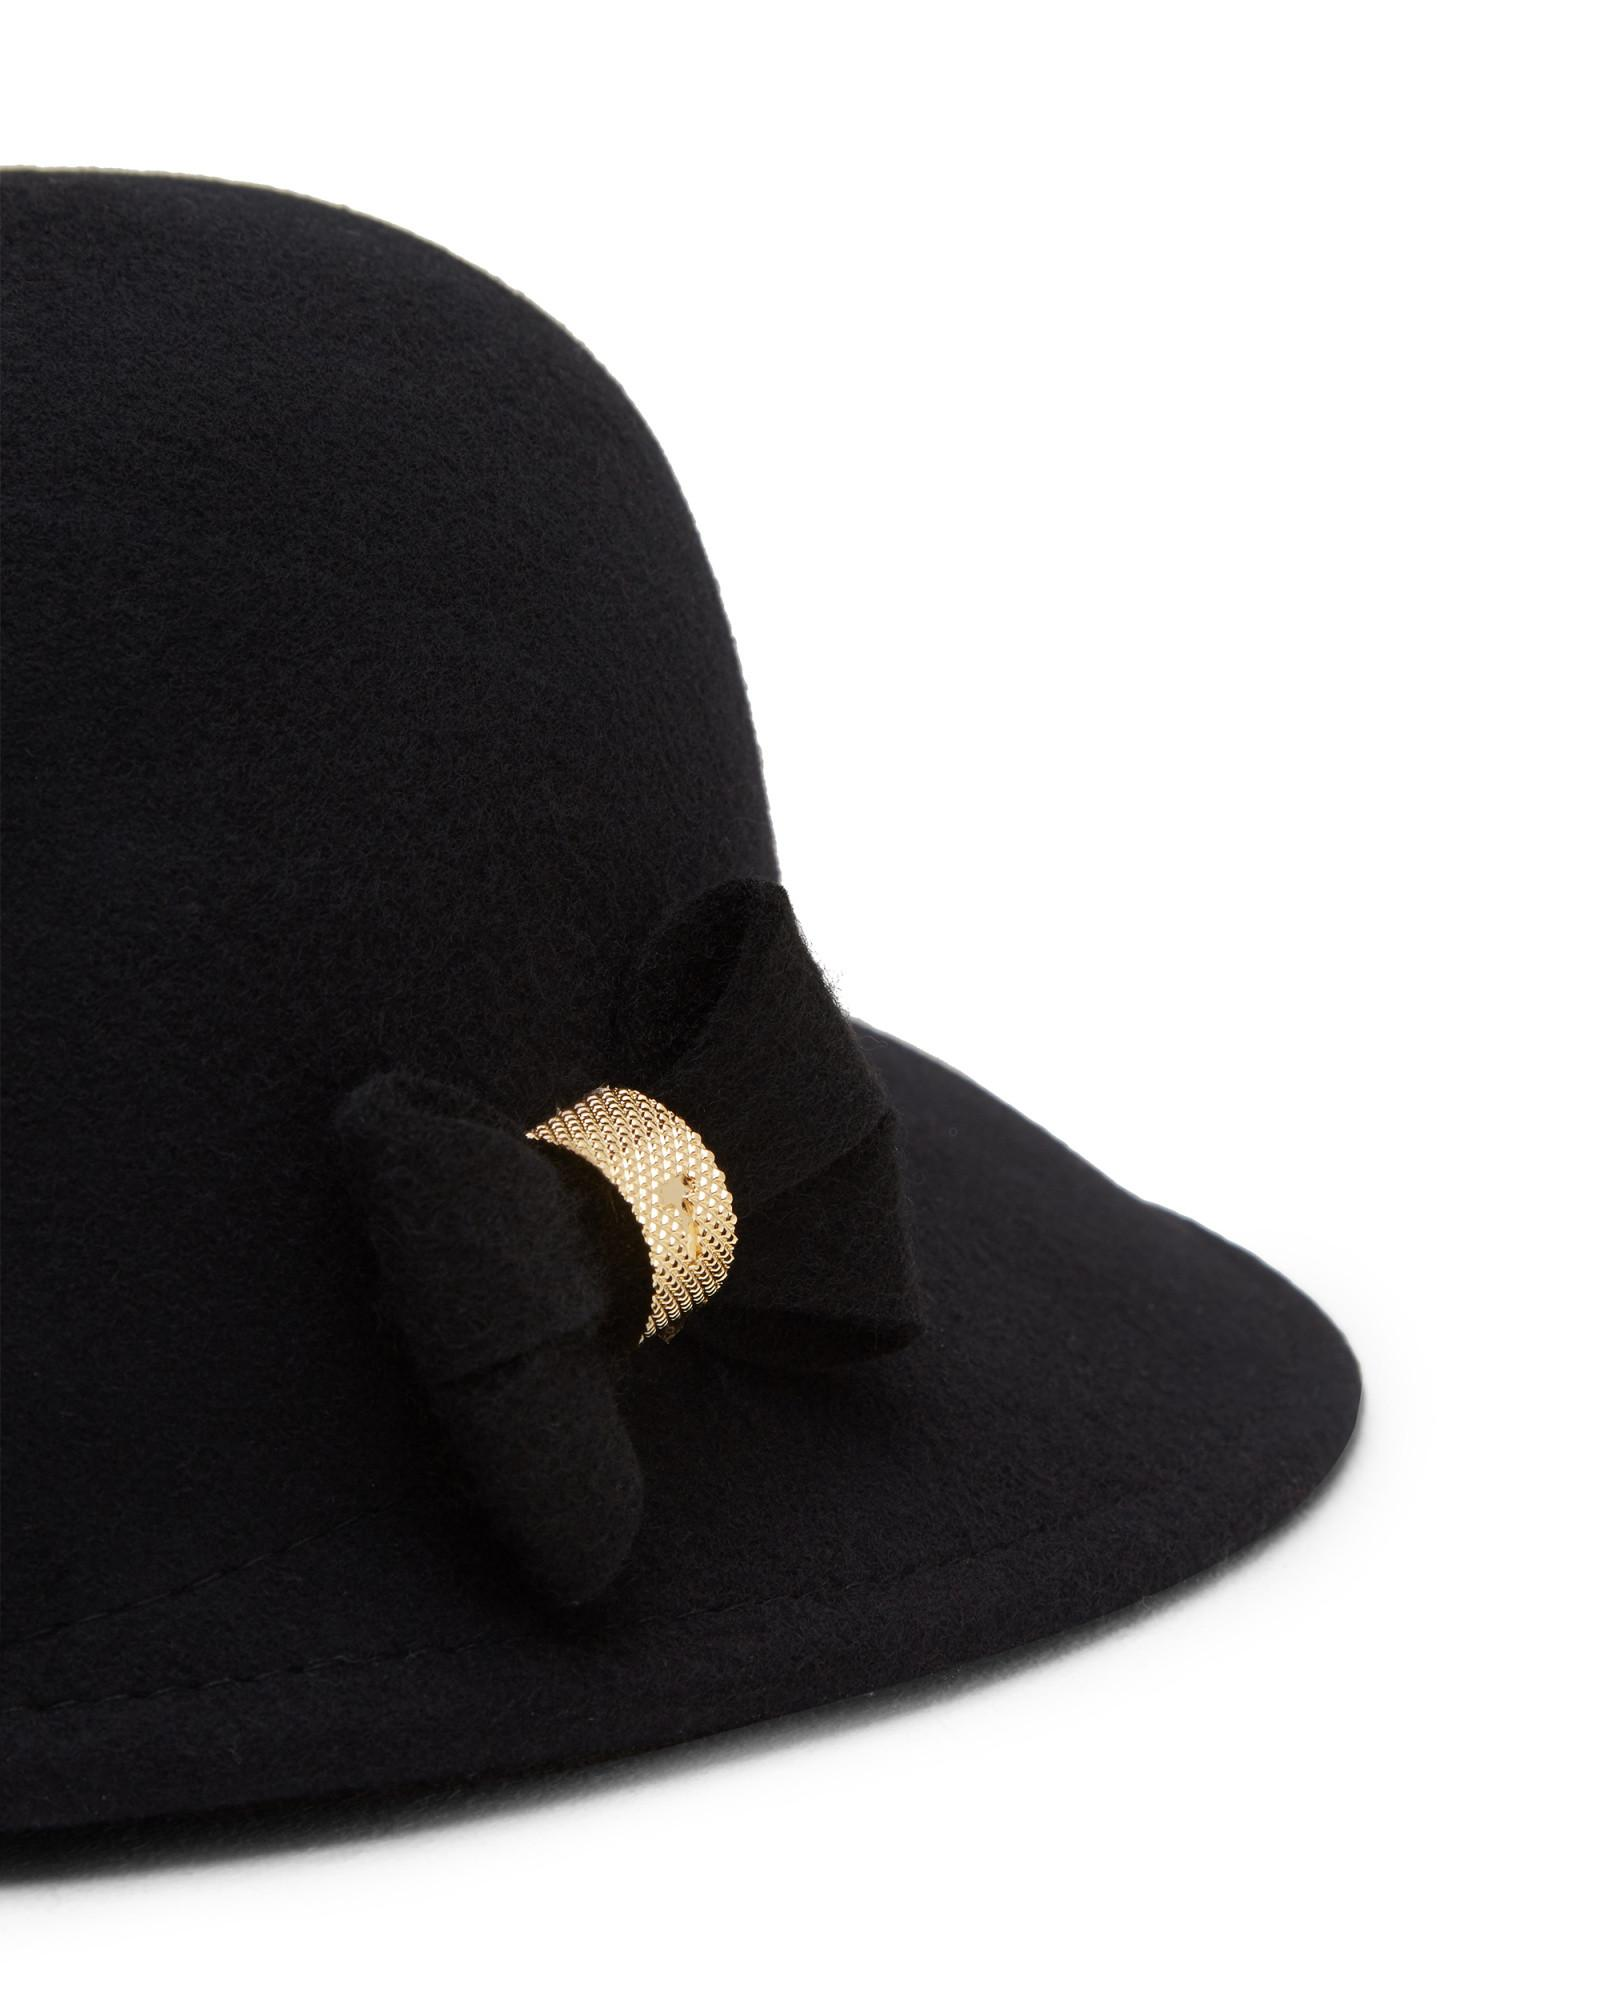 25e8395ab4489 Lyst - Ted Baker Mini Bow Cap in Black